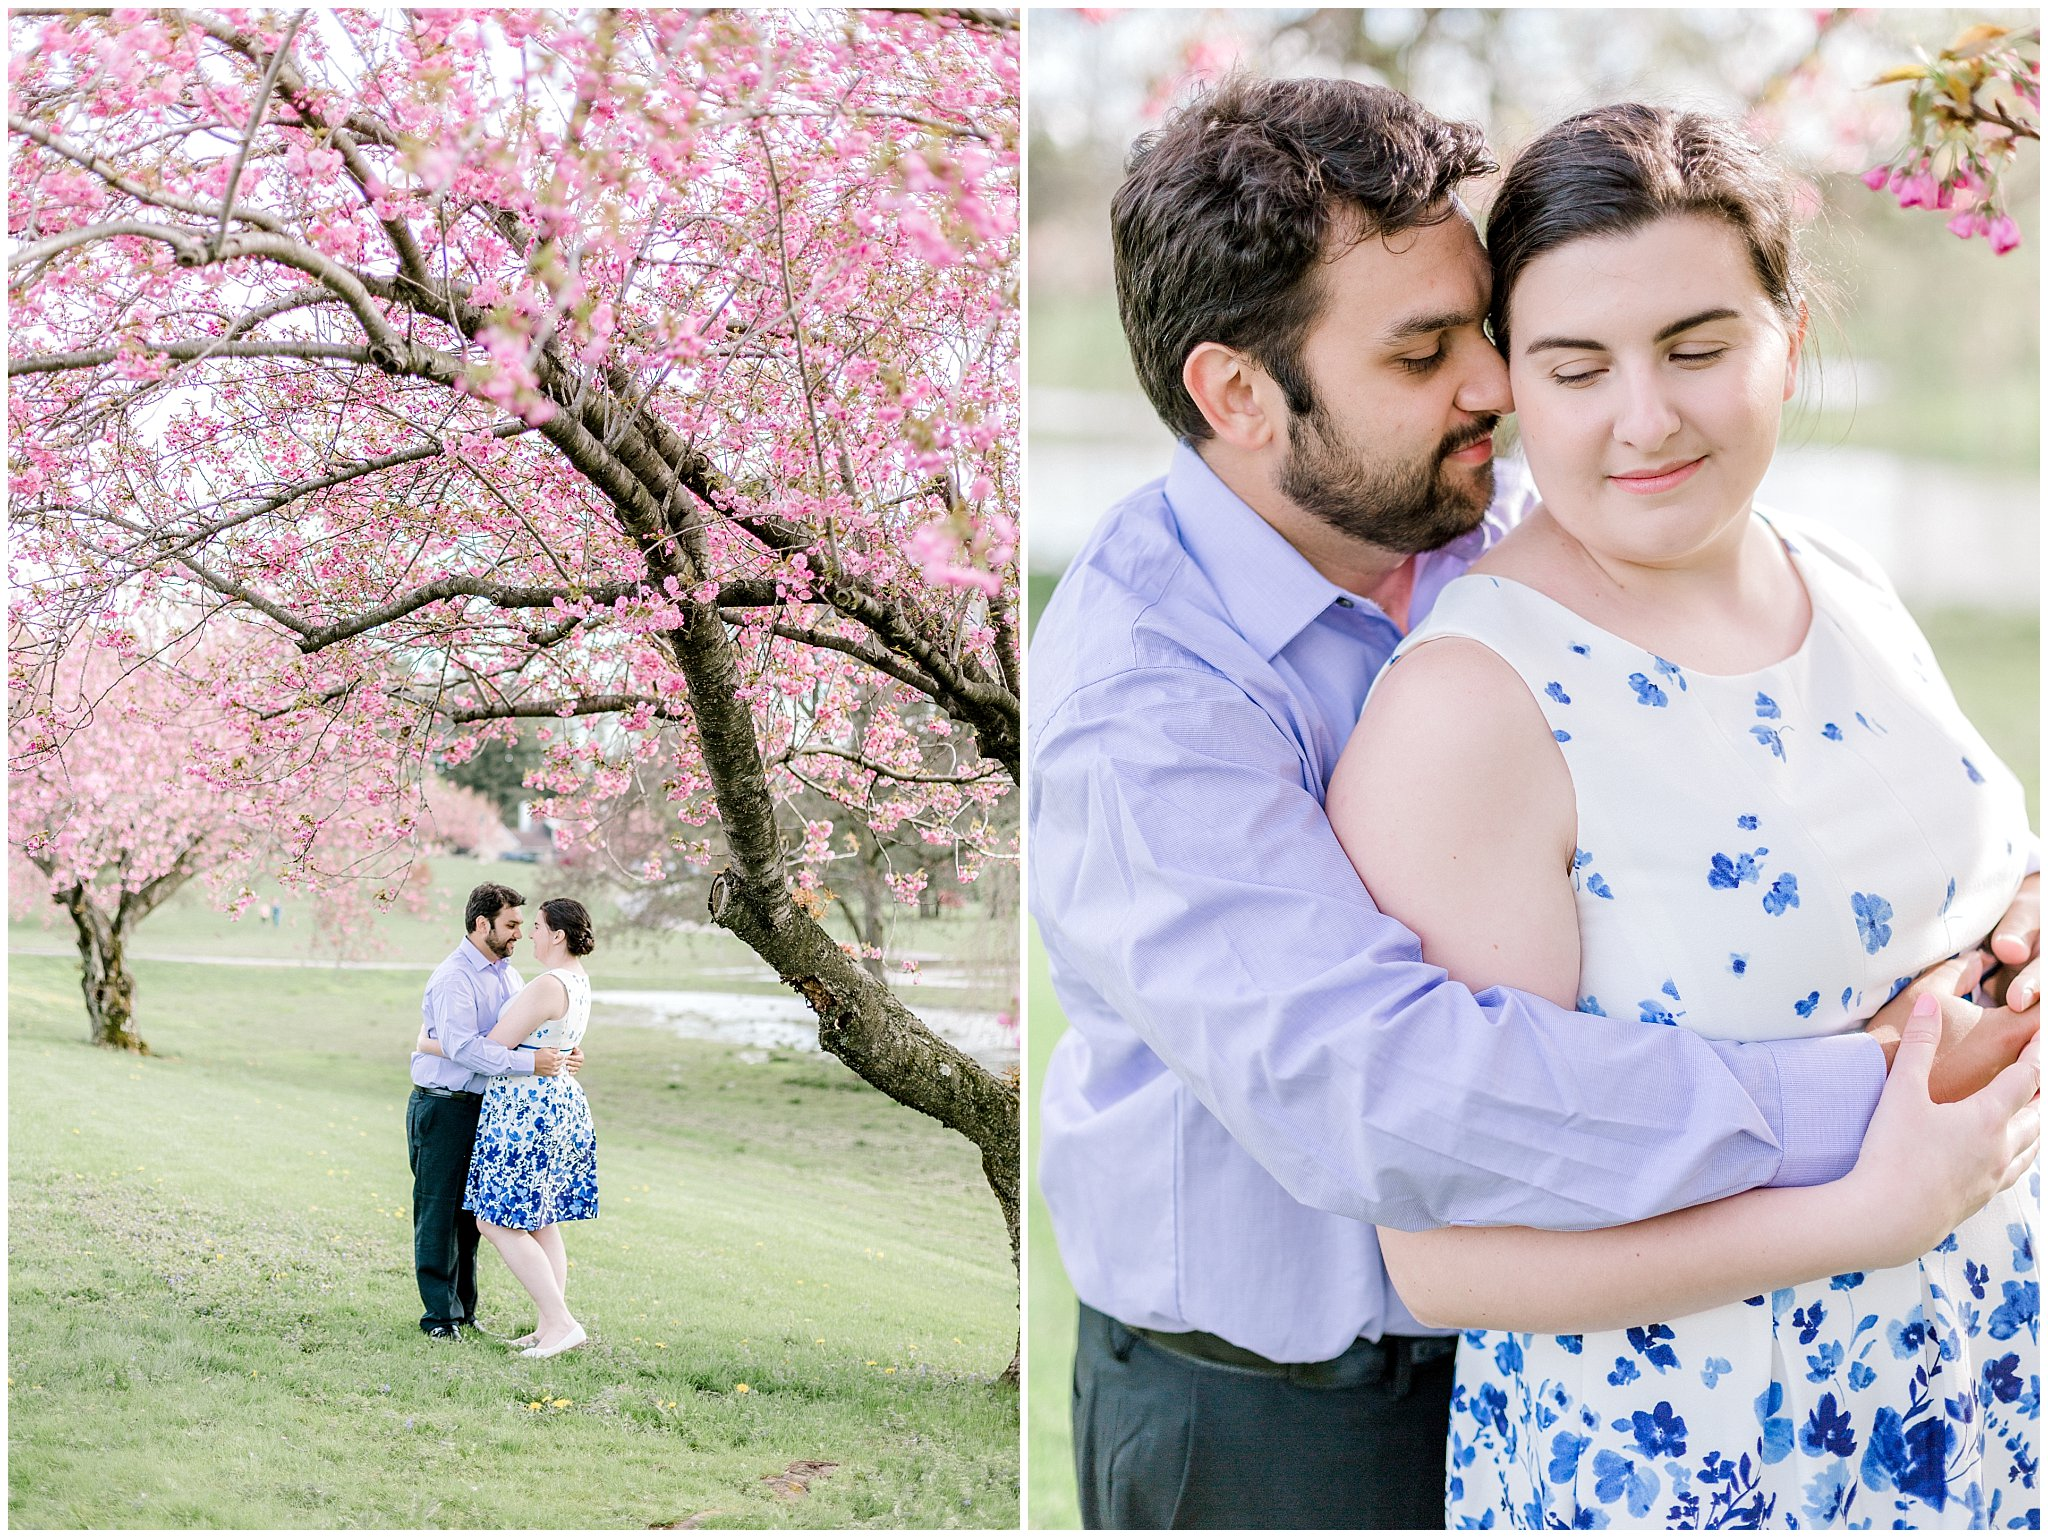 Lehigh Valley Spring Cherry Blossom Engagement Session Pennsylvania Wedding Photographer (7).jpg